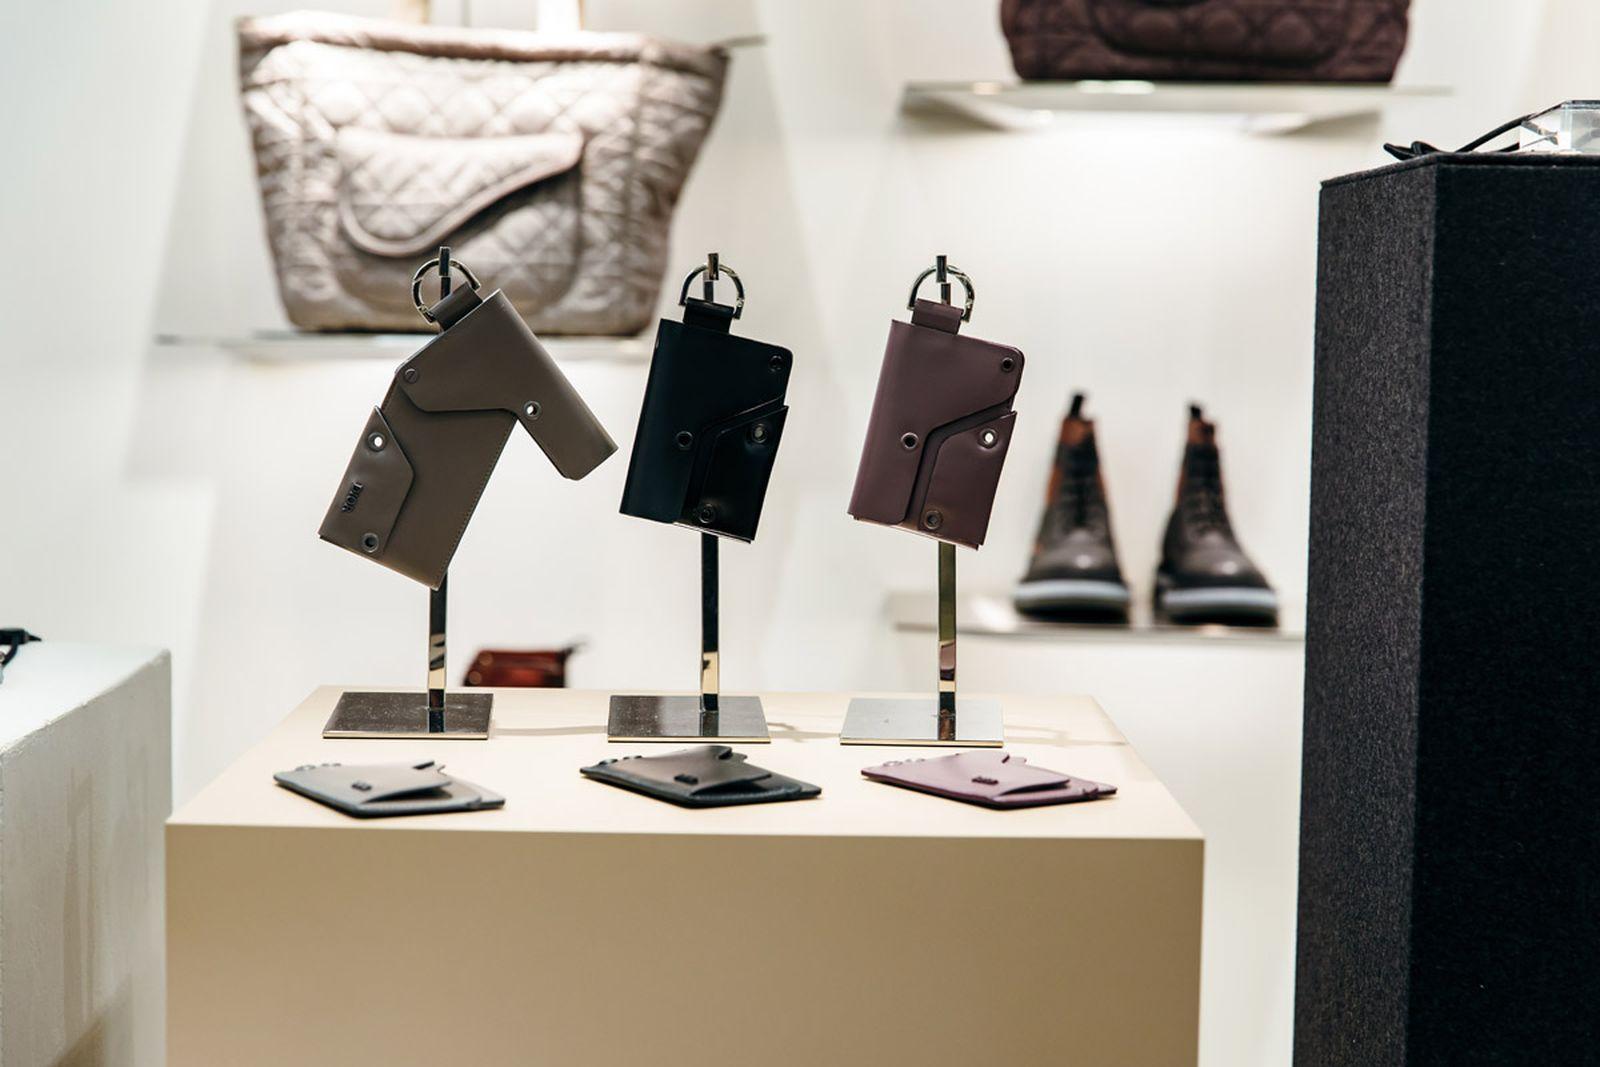 MFW19 Paris Dior ReSees Accessories JulienTell 18 kim jones pfw